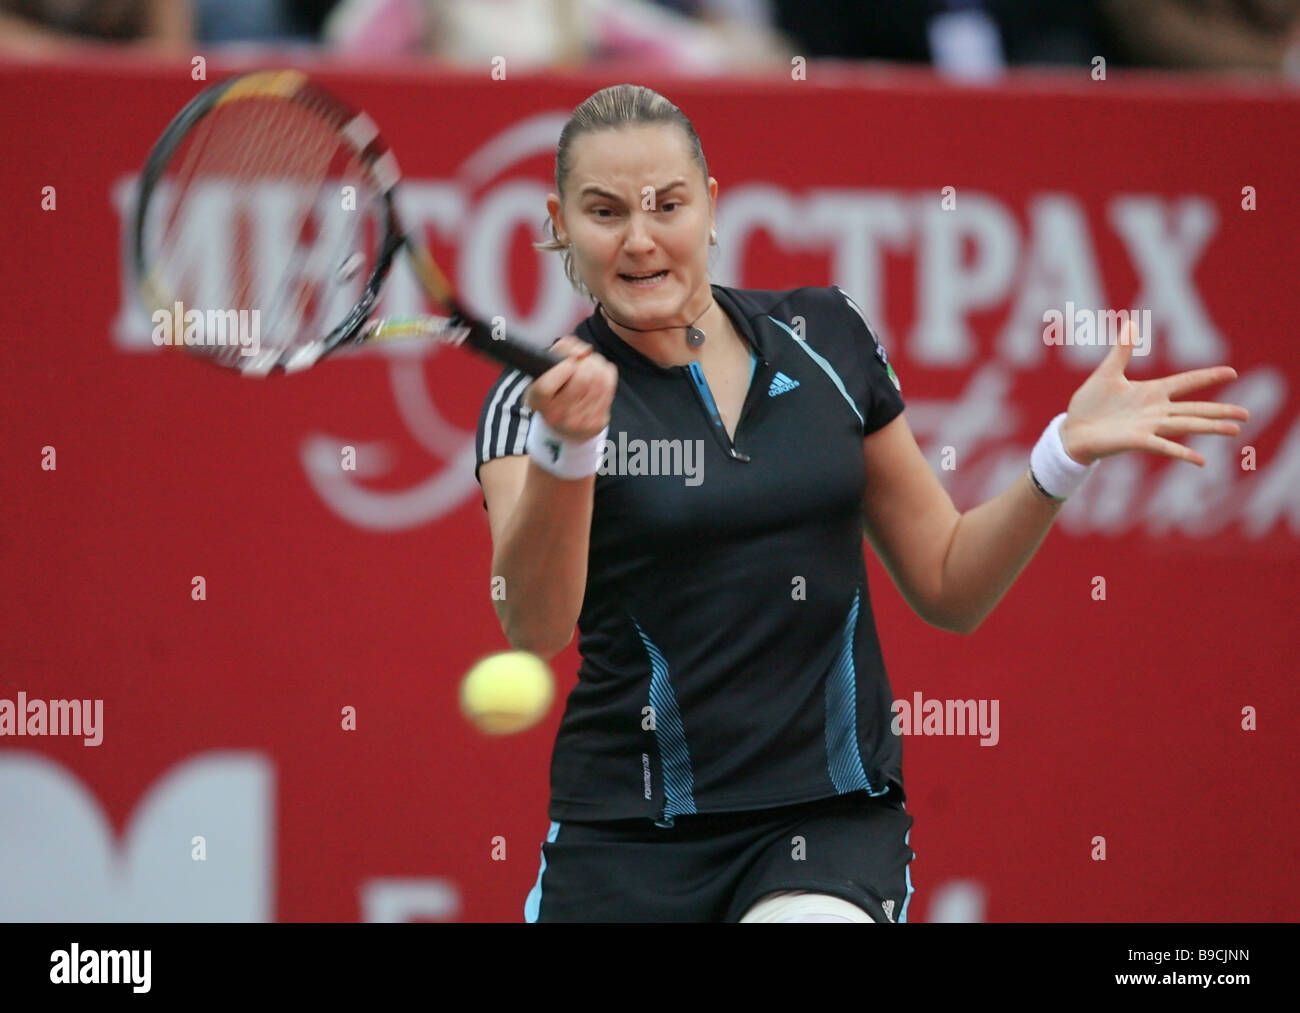 Russian tennis player Nadezhda Petrova during the final match of the 17th international tennis tournament Kremlin Cup Stock Photo